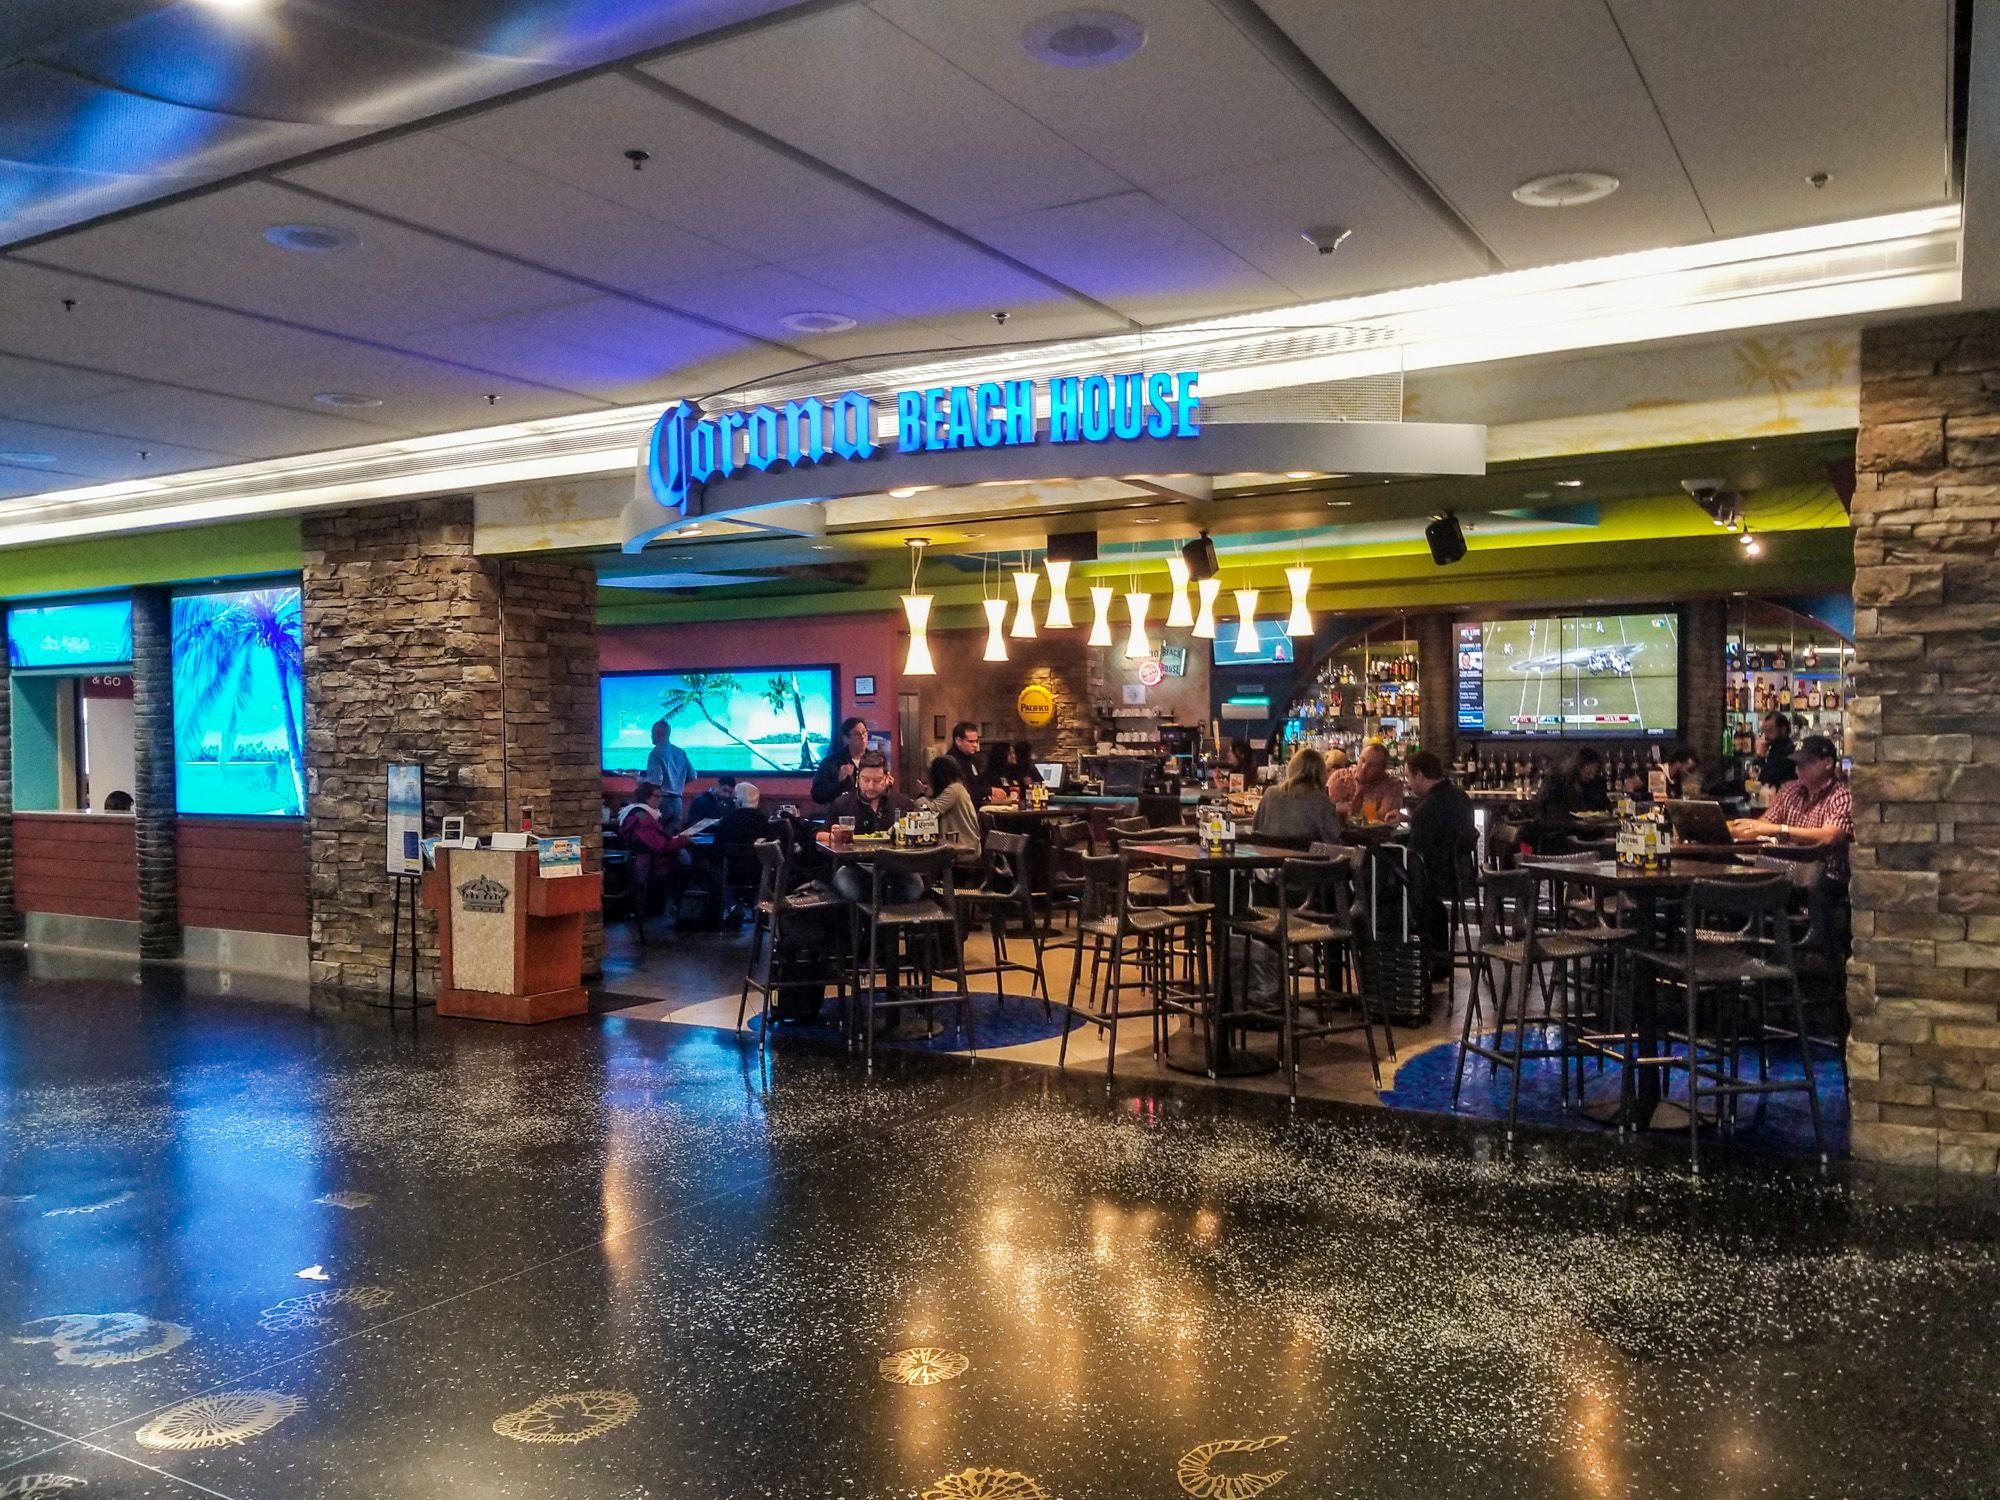 Lounge Review: Corona Beach House at Miami International Airport (MIA)